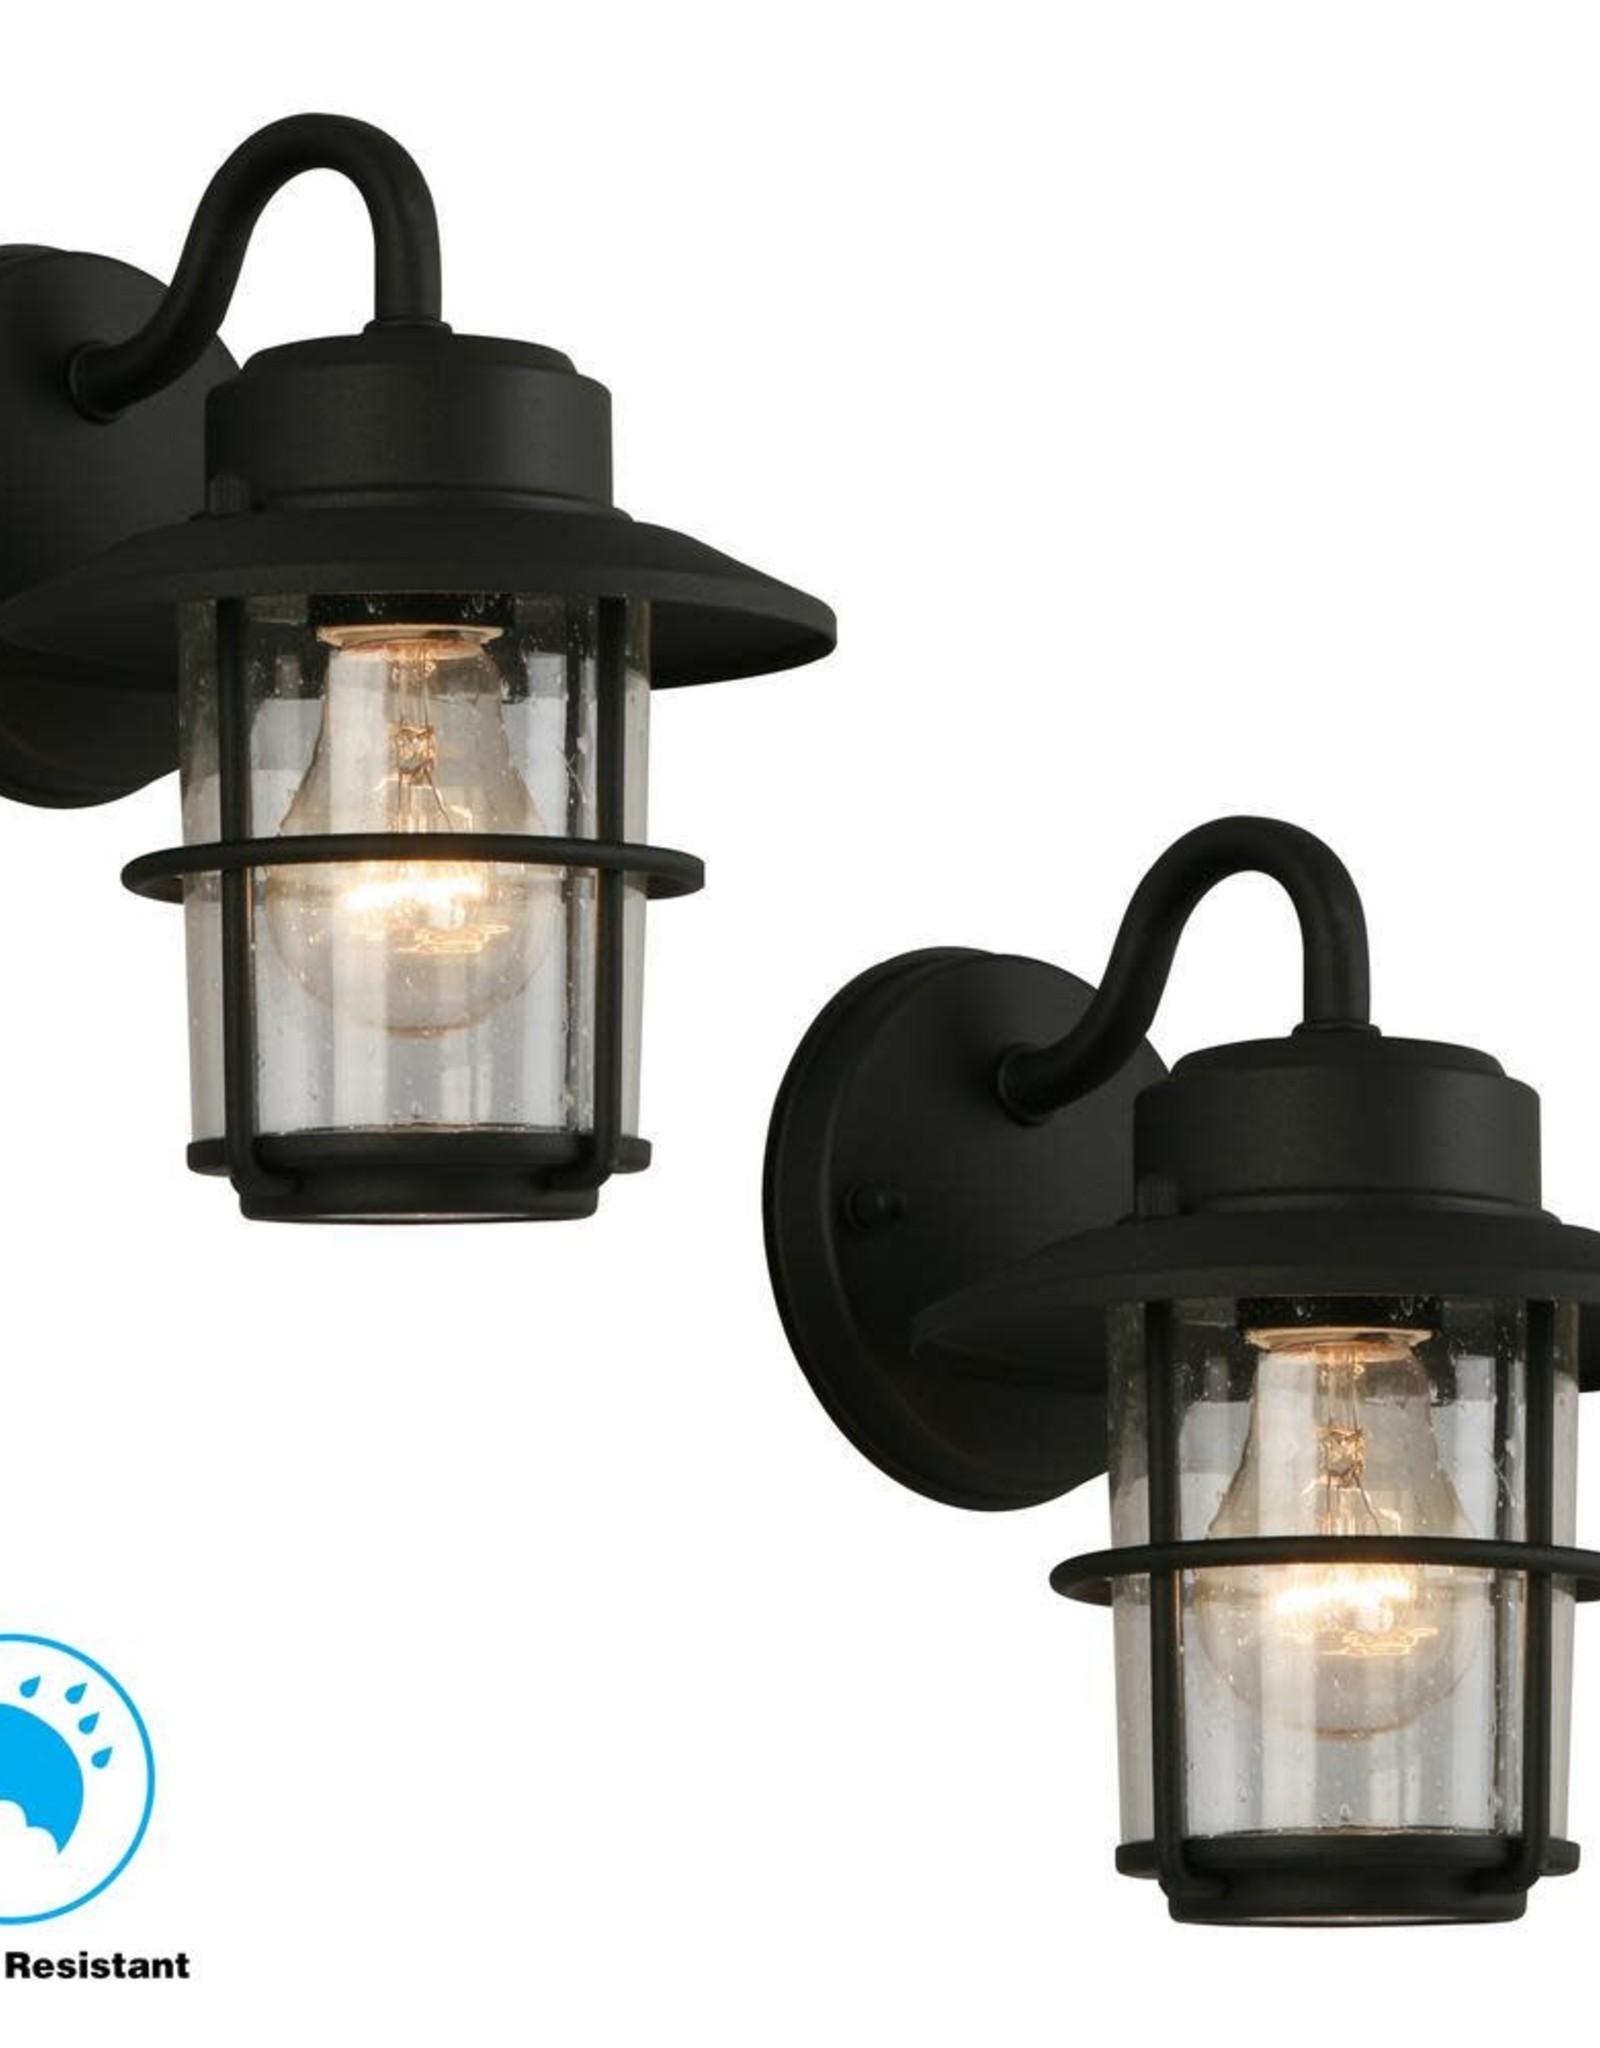 Hampton Bay 1-Light Black Outdoor Wall Lantern Sconce (2-Pack) (258) 4530